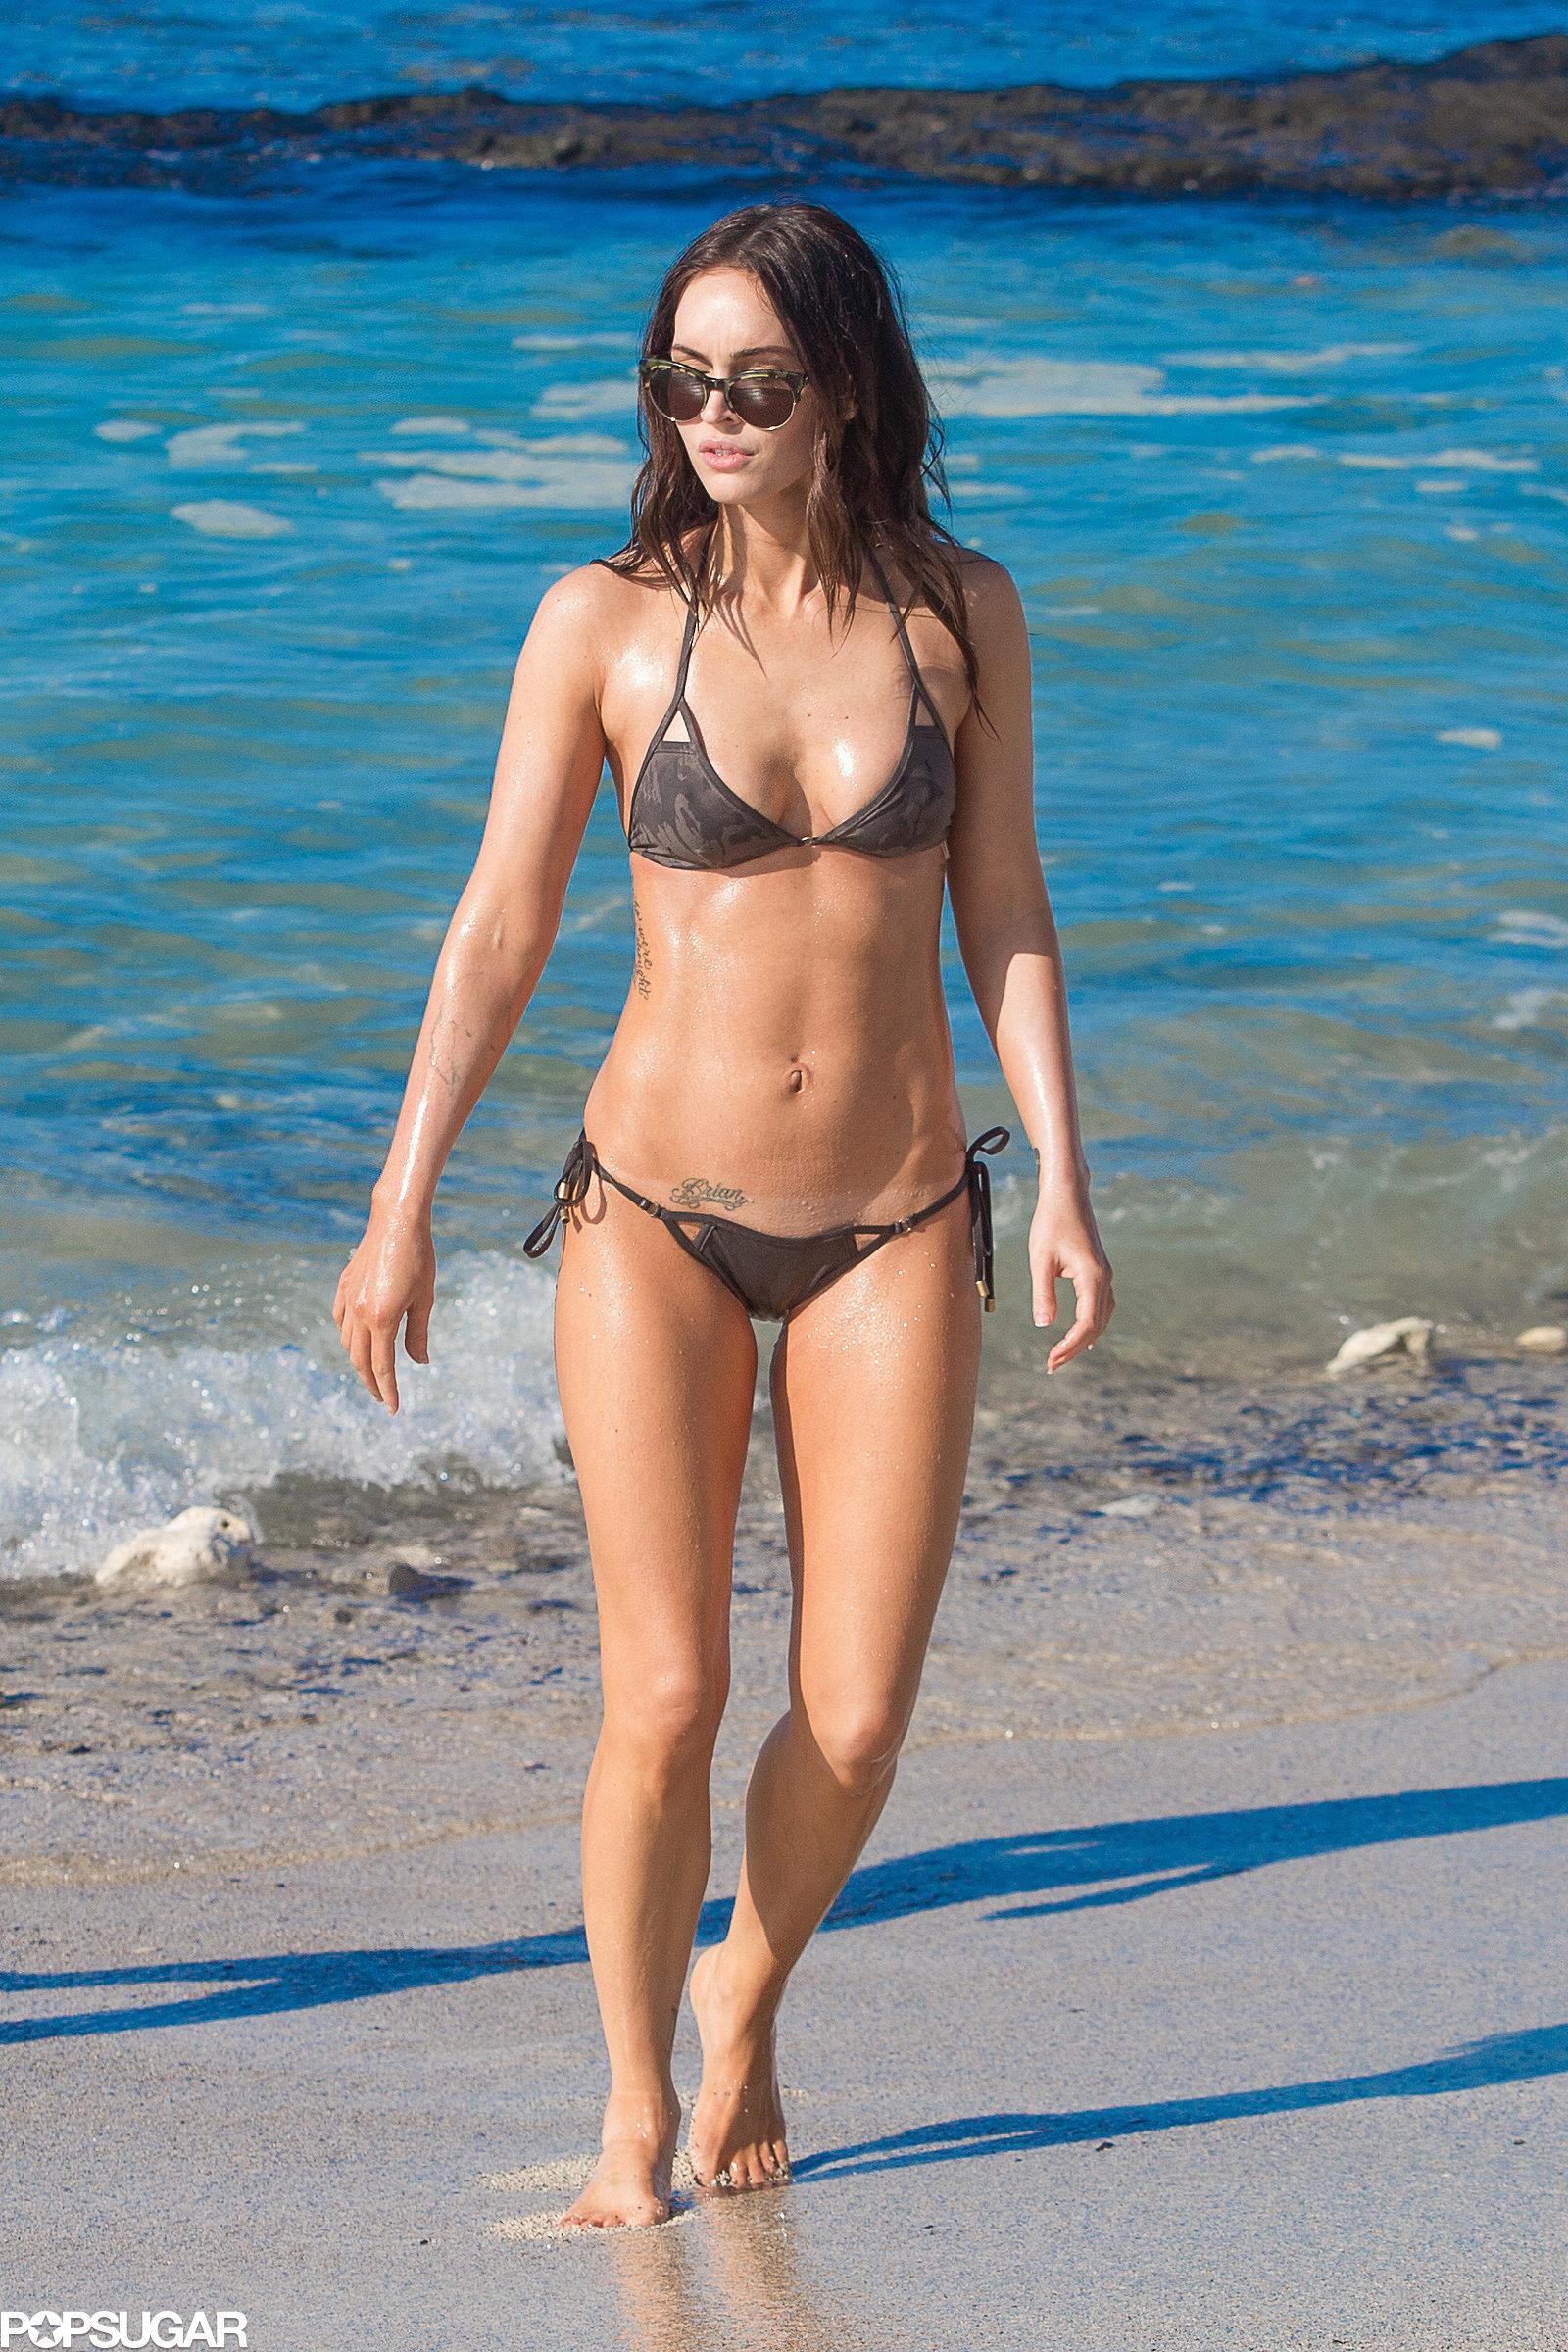 Megan Fox sexy bikini picture